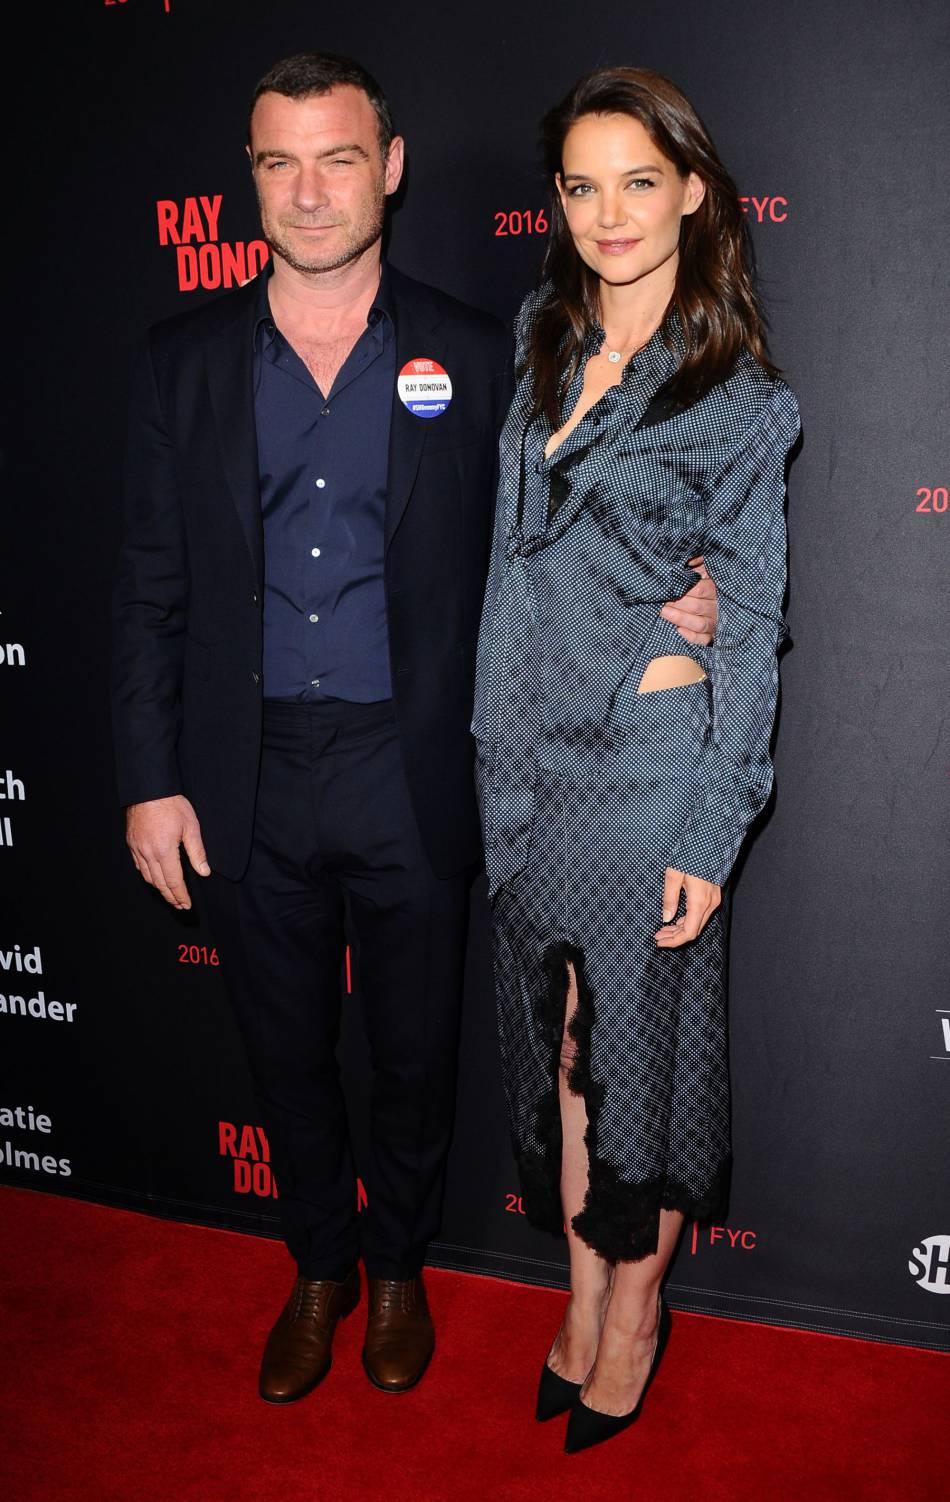 Katie Holmes et Liev Schreiber posent sur le red carpet.